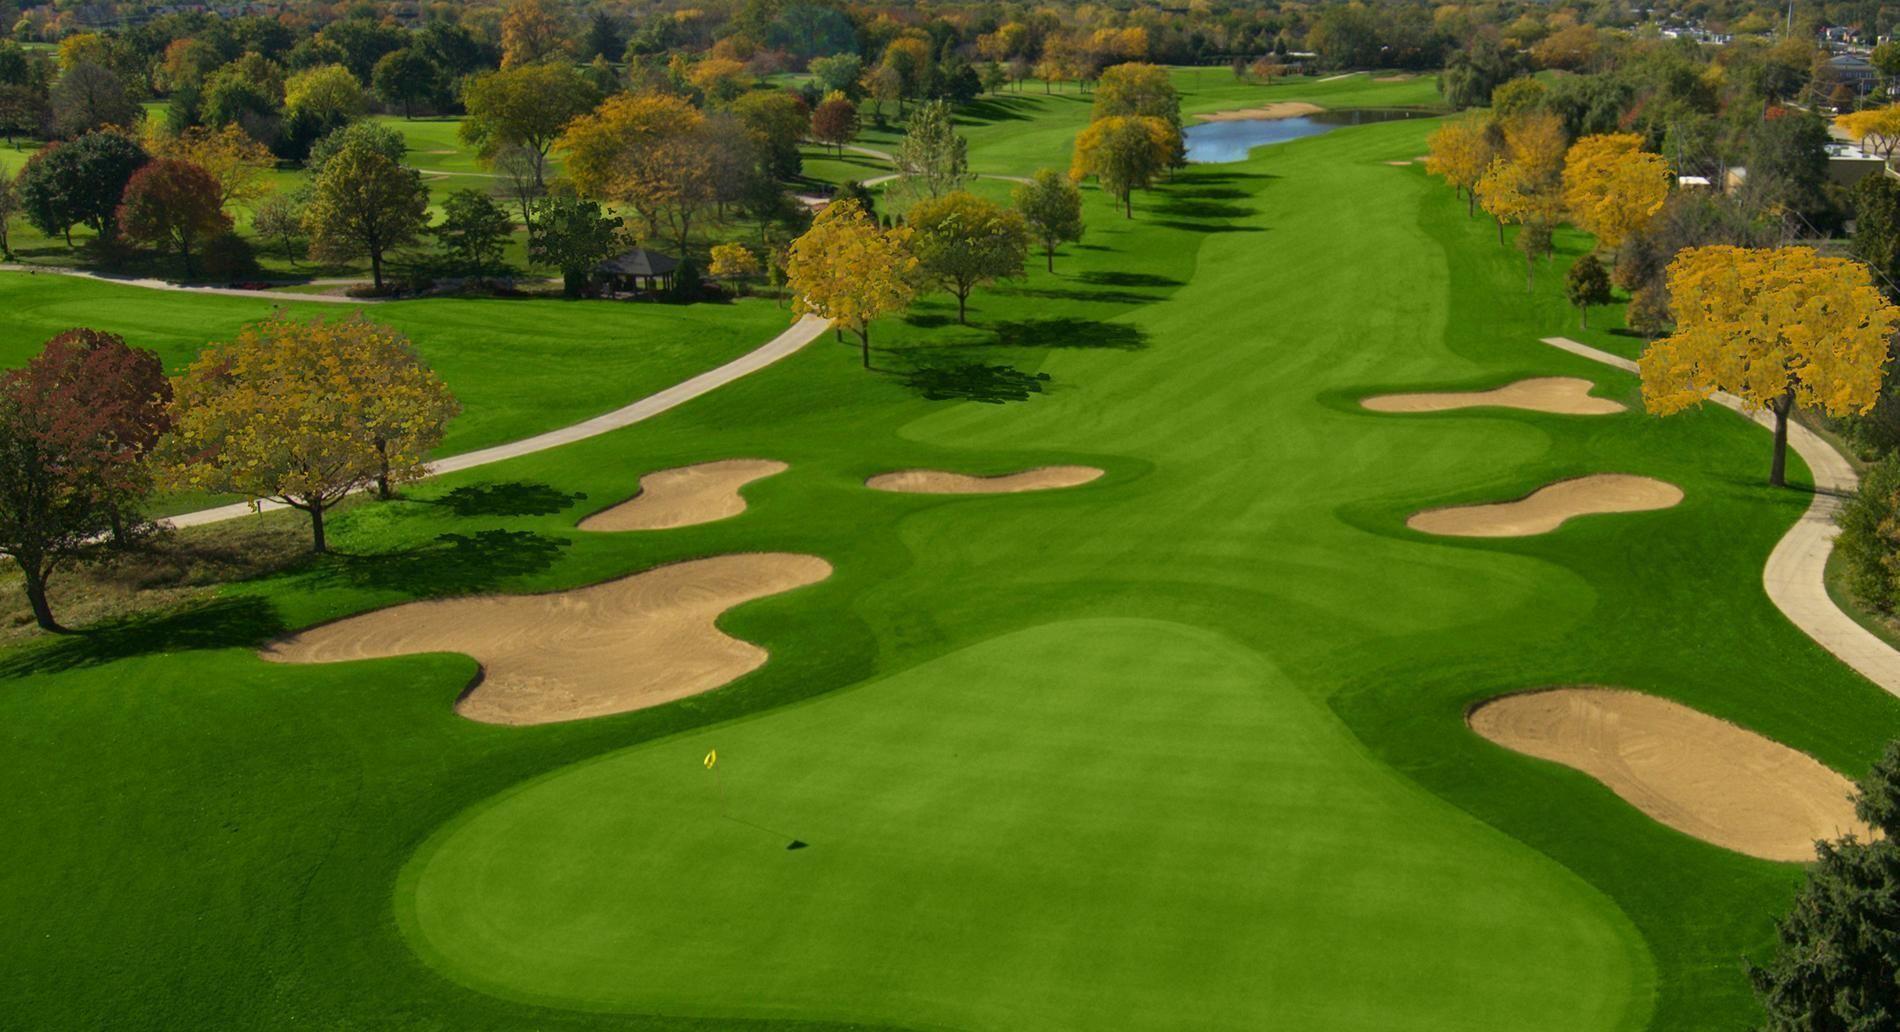 Village Links Of Glen Ellyn In 2020 Public Golf Courses Golf Courses Golf